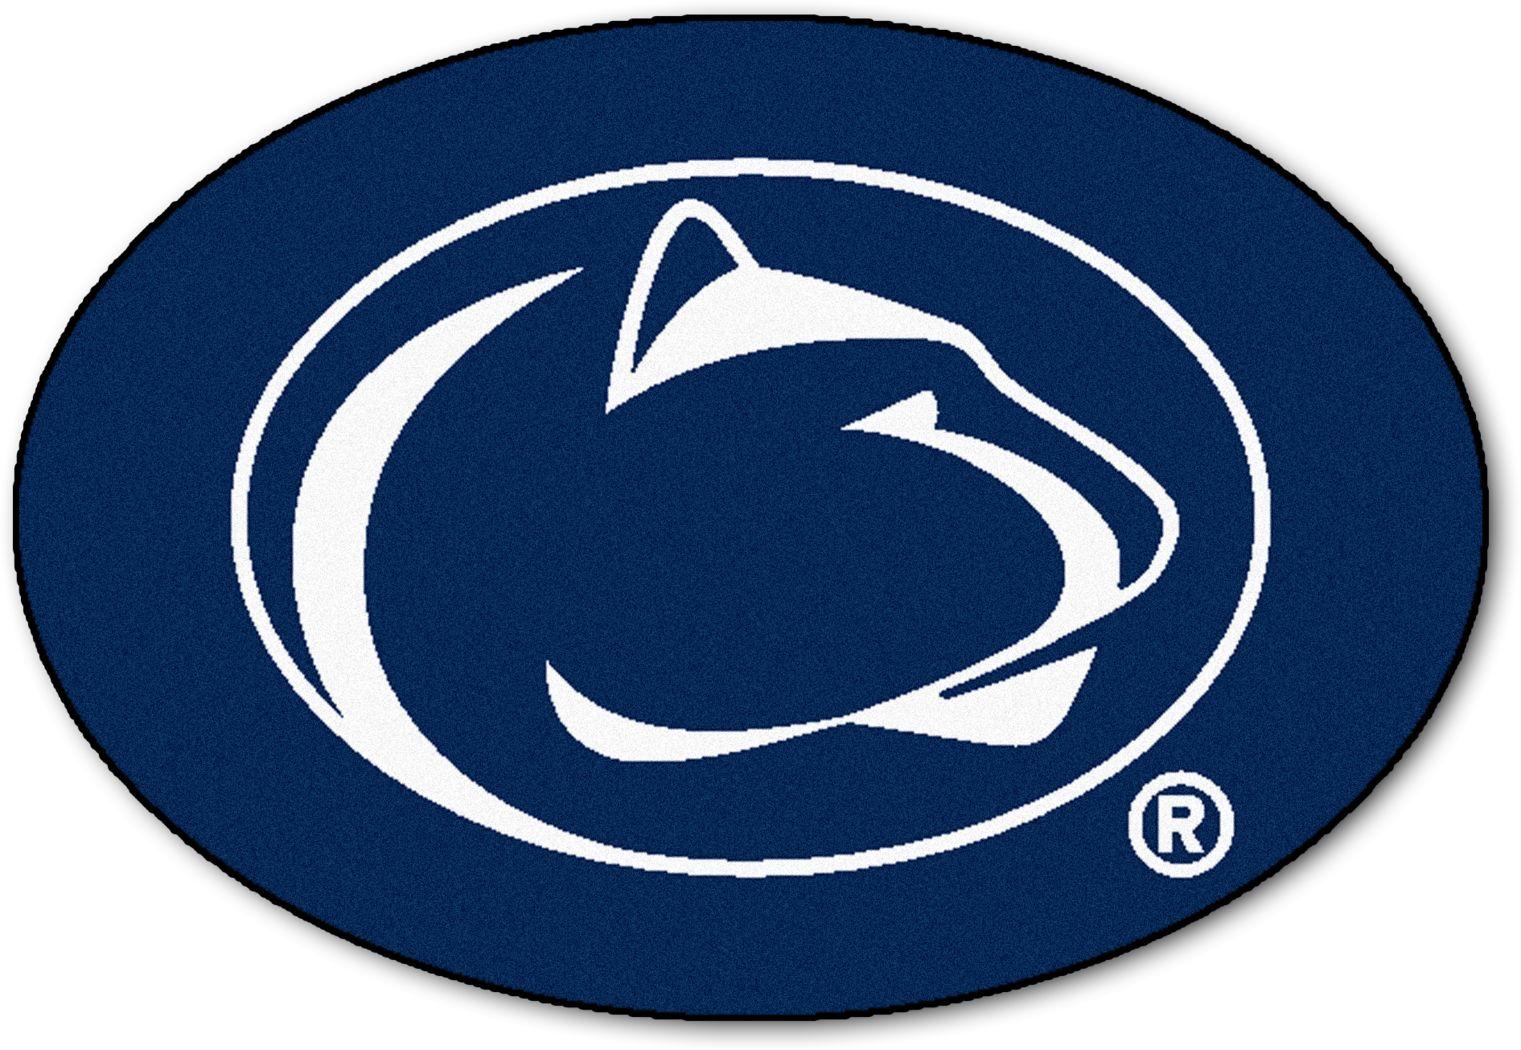 "NCAA Football Mascot Penn State University 1'6"" x 2' Rug"